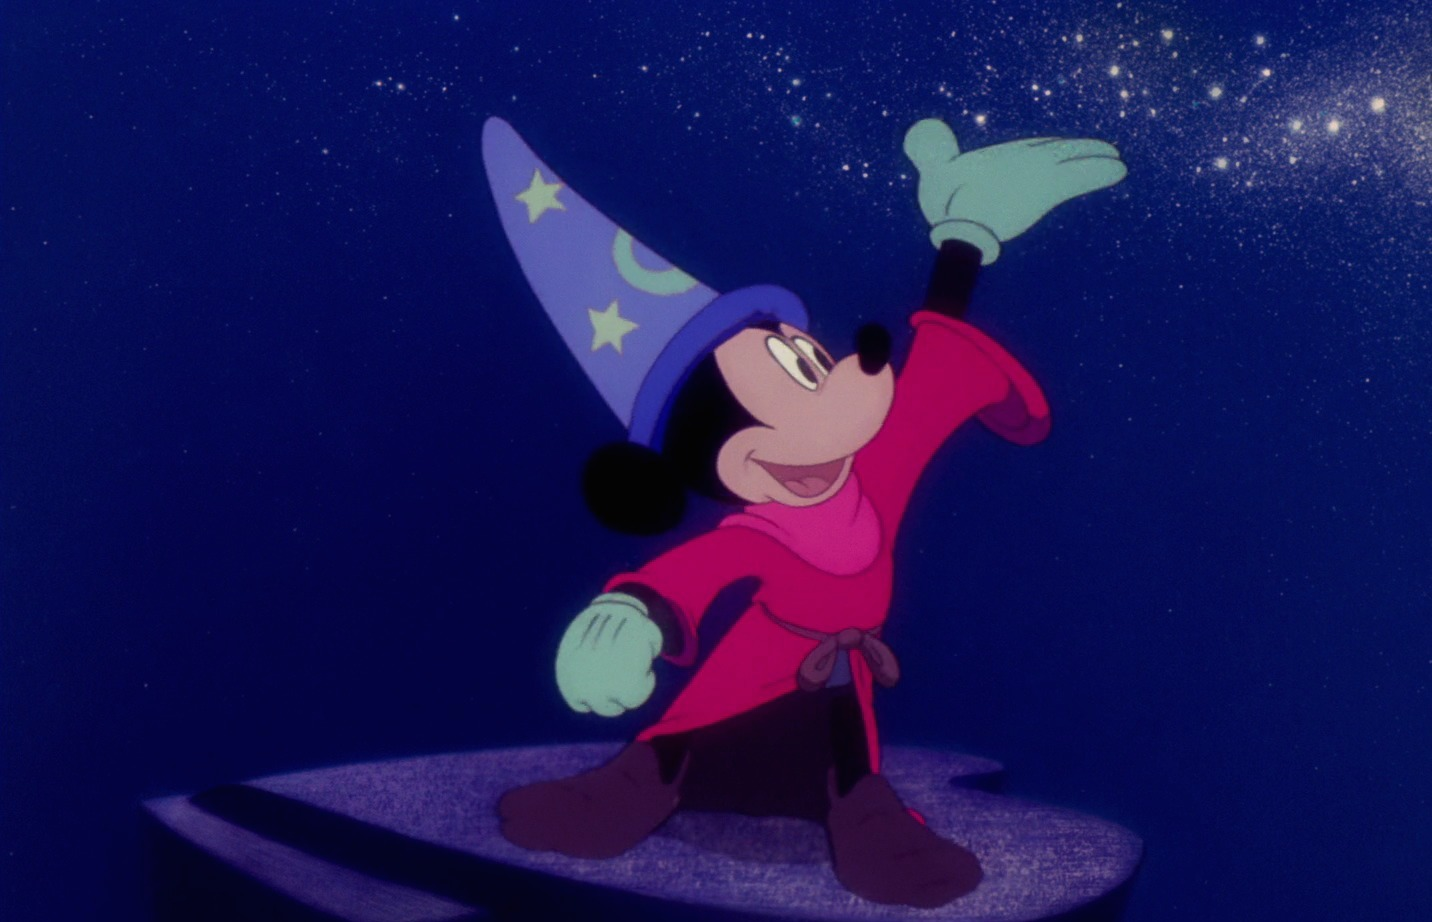 Fantasia - Sorcerer Mickey